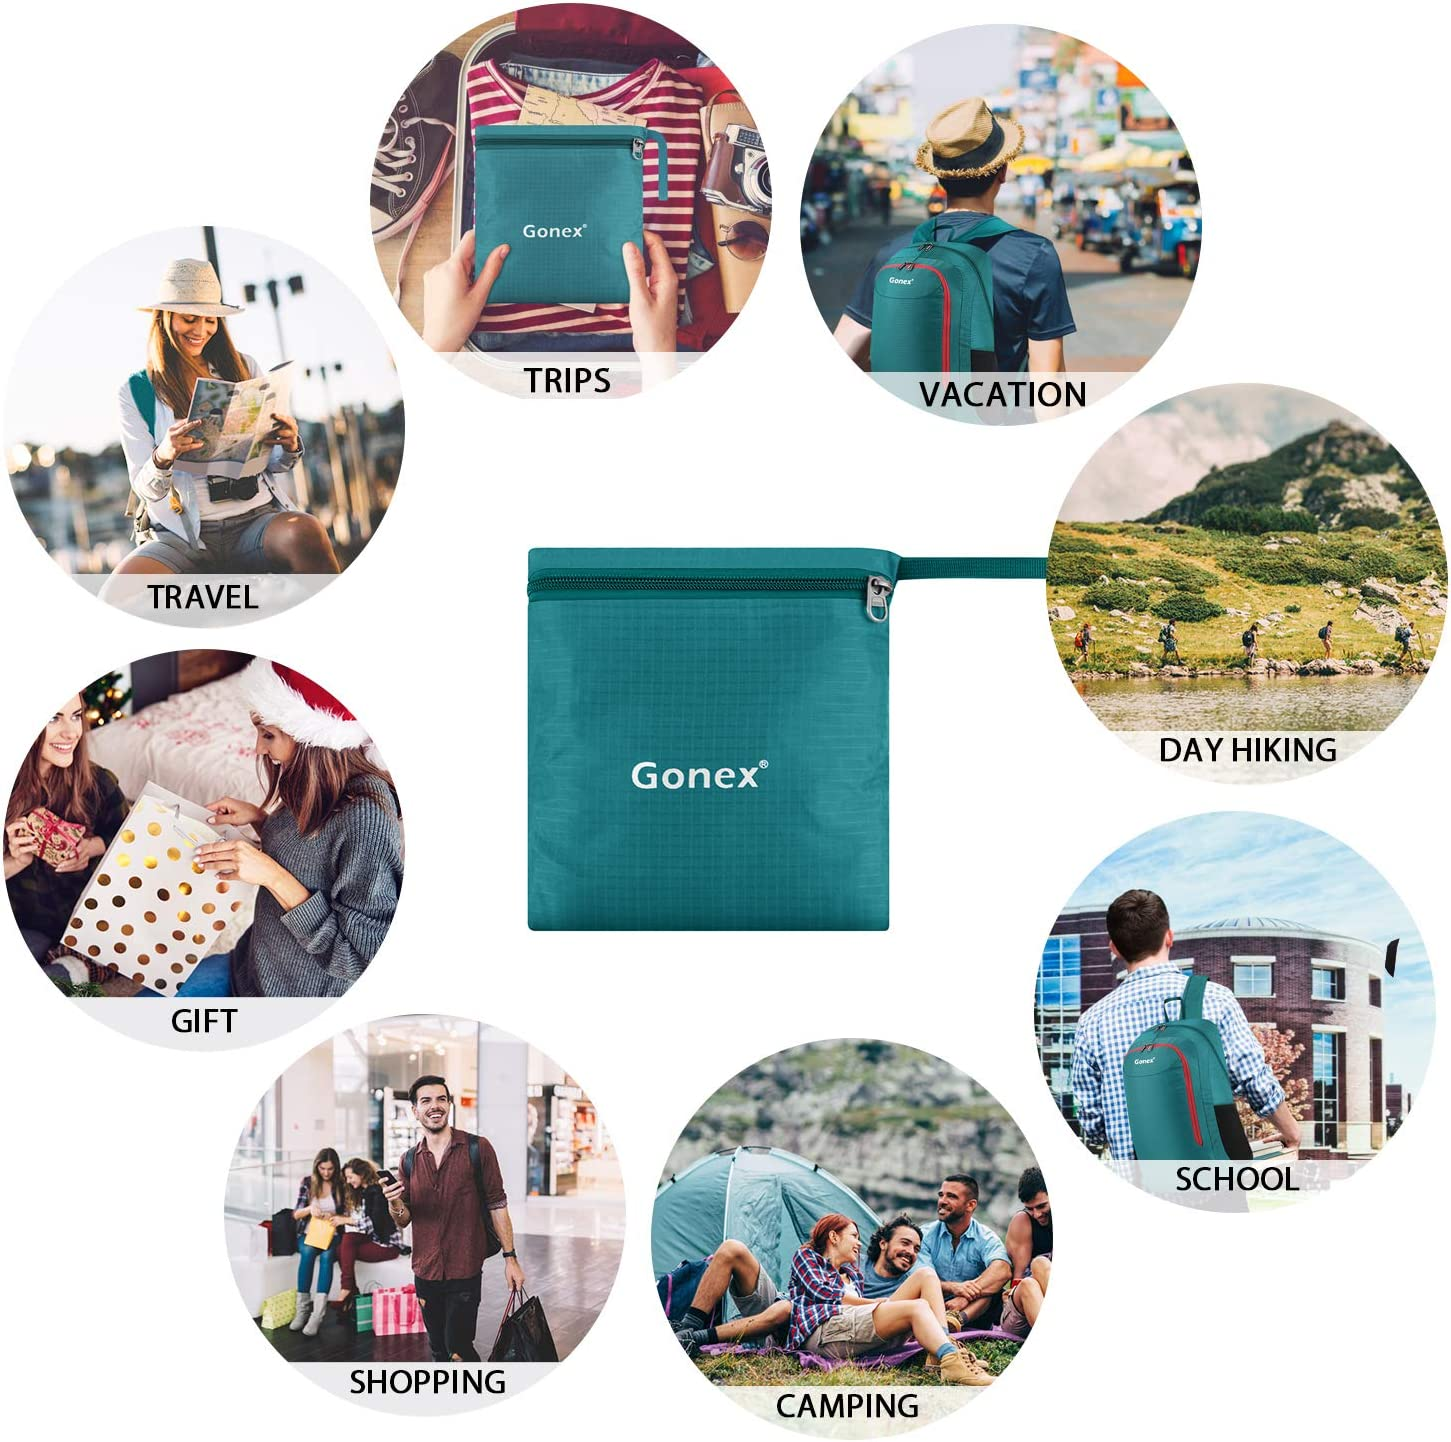 Gonex 28L Lightweight Packable Backpack Handy Travel Hiking Daypack